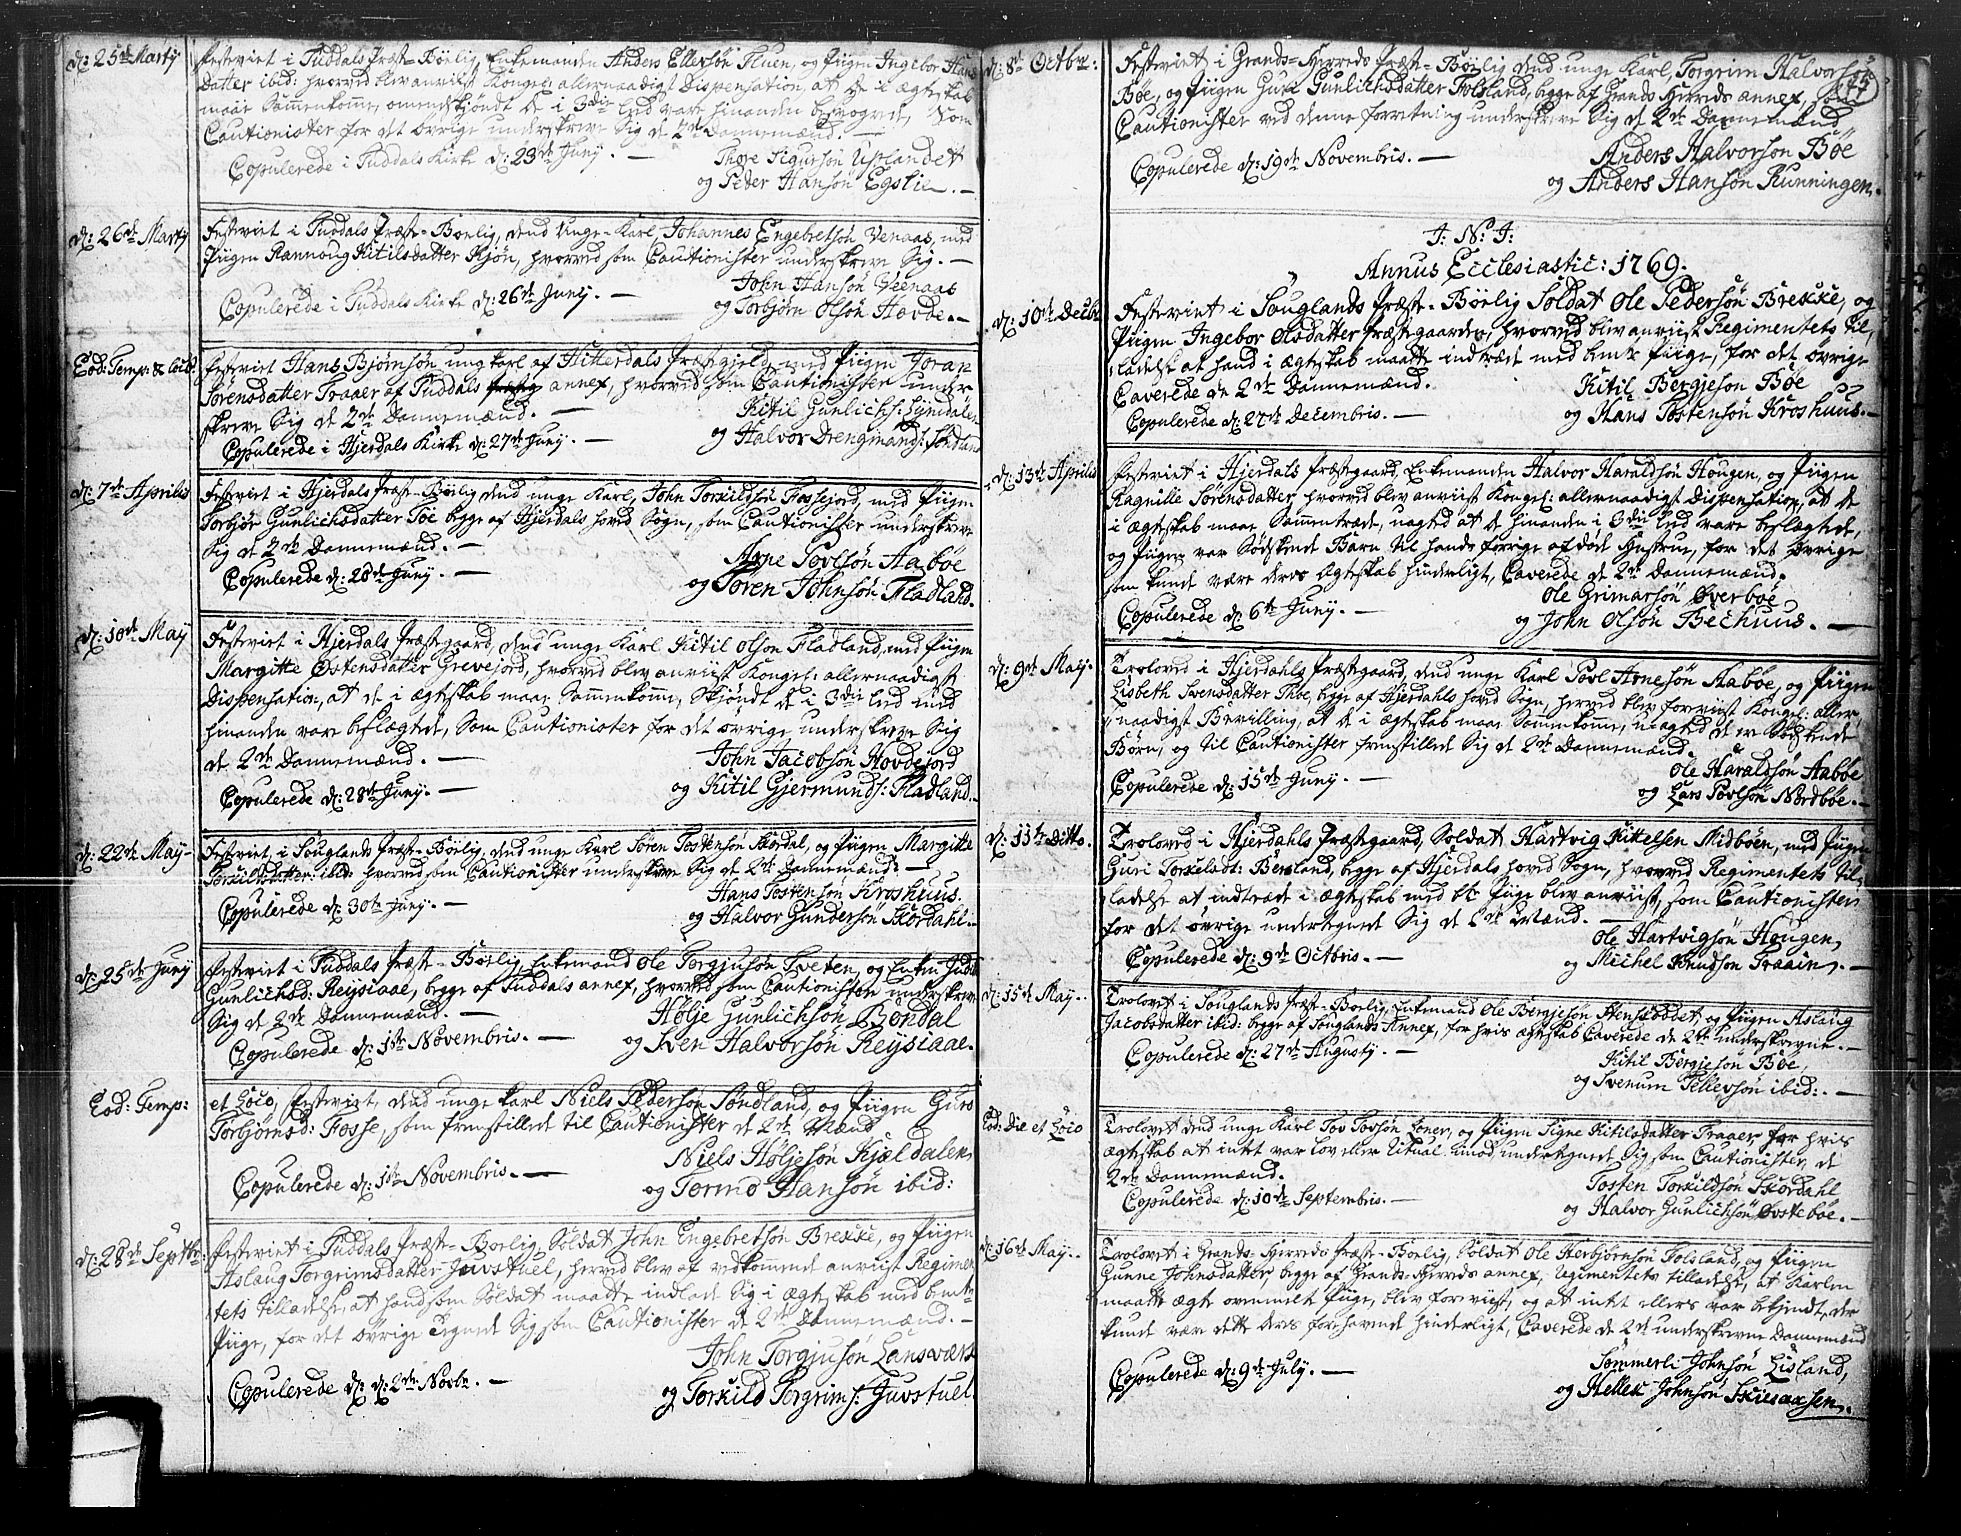 SAKO, Hjartdal kirkebøker, F/Fa/L0004: Ministerialbok nr. I 4, 1727-1795, s. 47